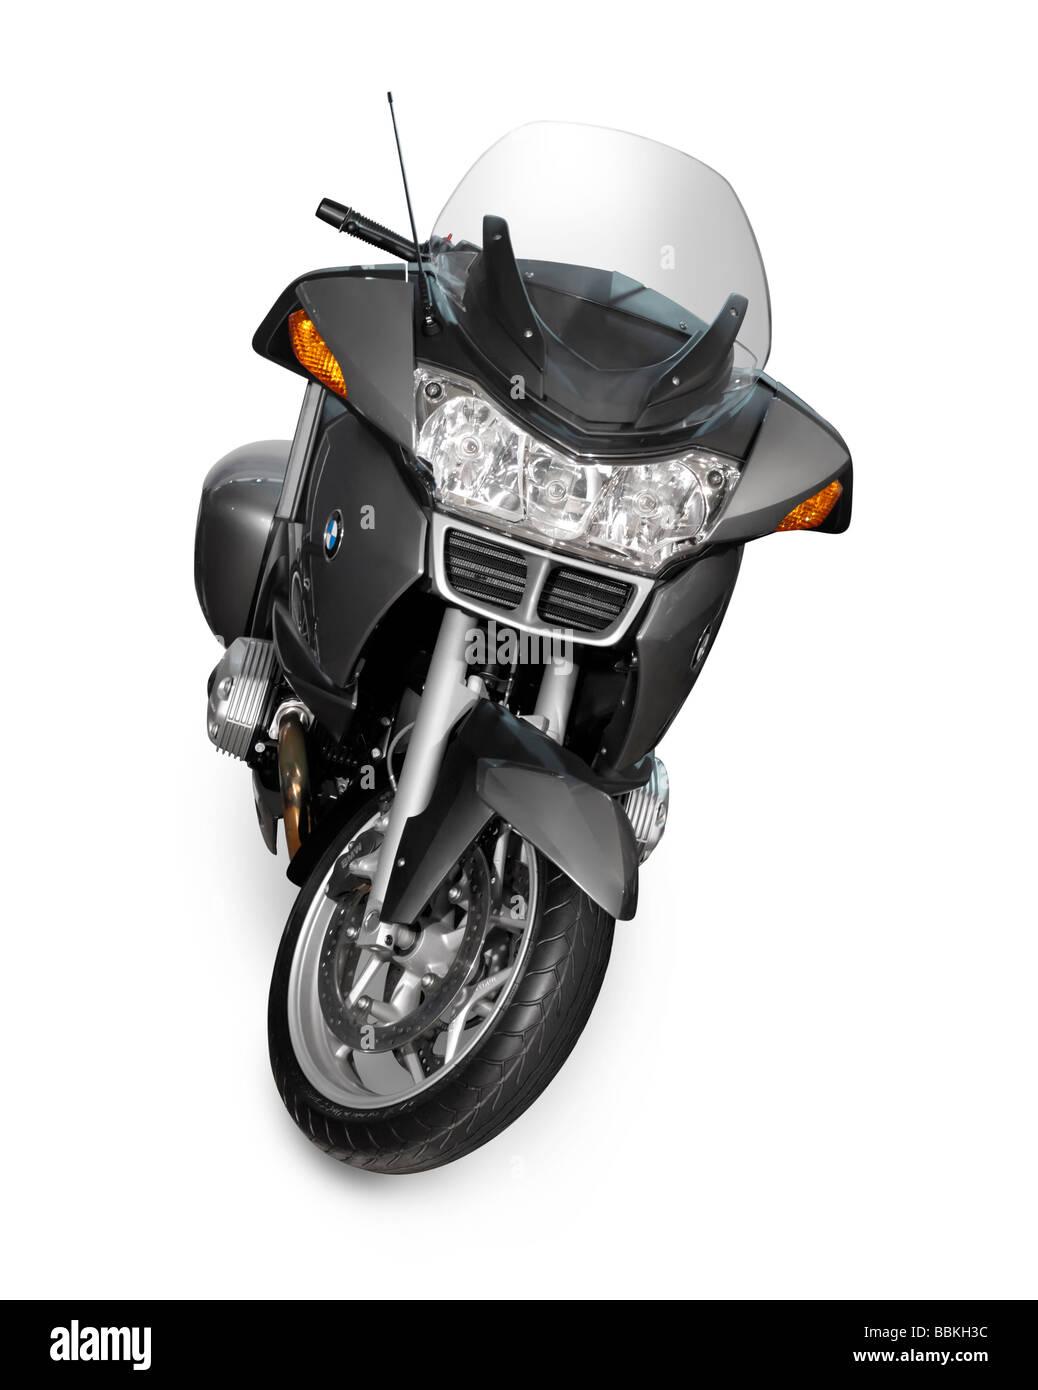 2006 BMW R 1200 RT touring motorcycle - Stock Image